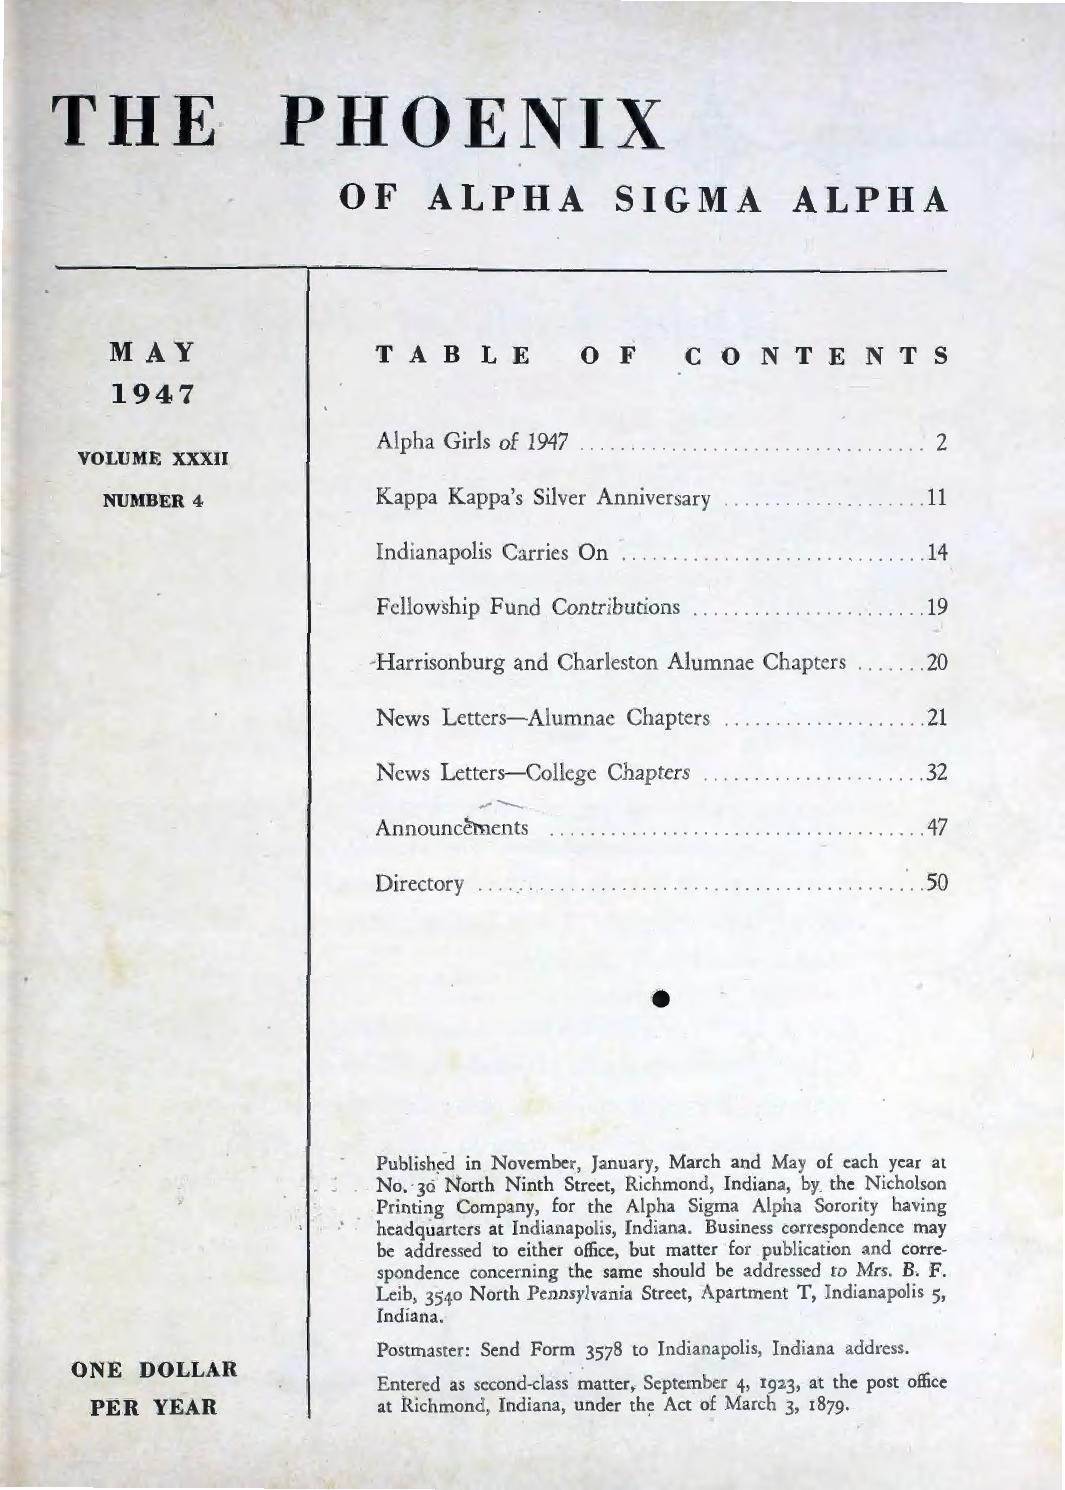 Asa phoenix vol 32 no 4 may 1947 by Alpha Sigma Alpha Sorority - issuu 151ab9b320824